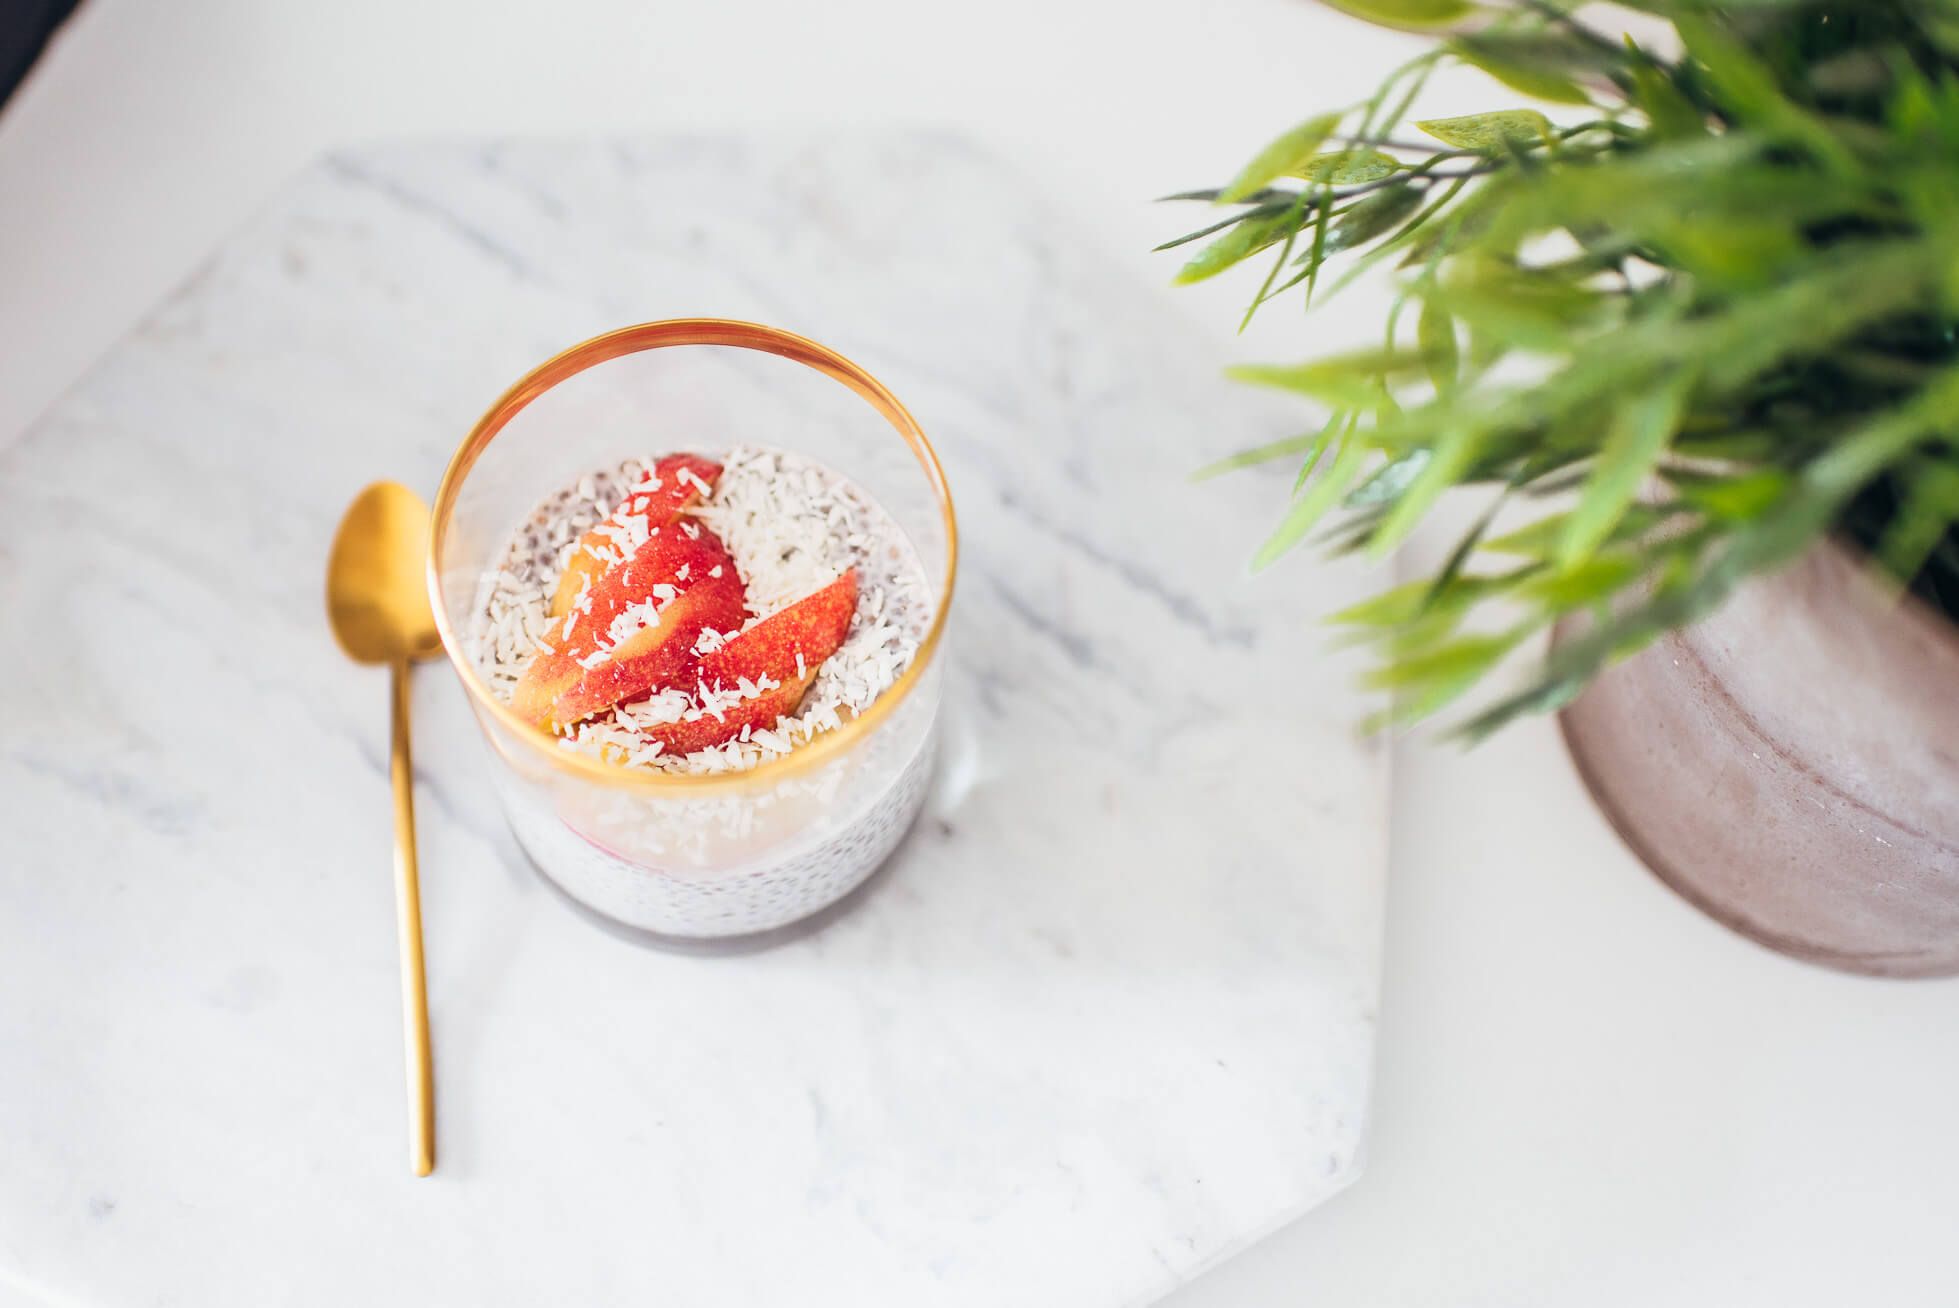 janni-deler-vanilla-chia-puddingDSC_5700